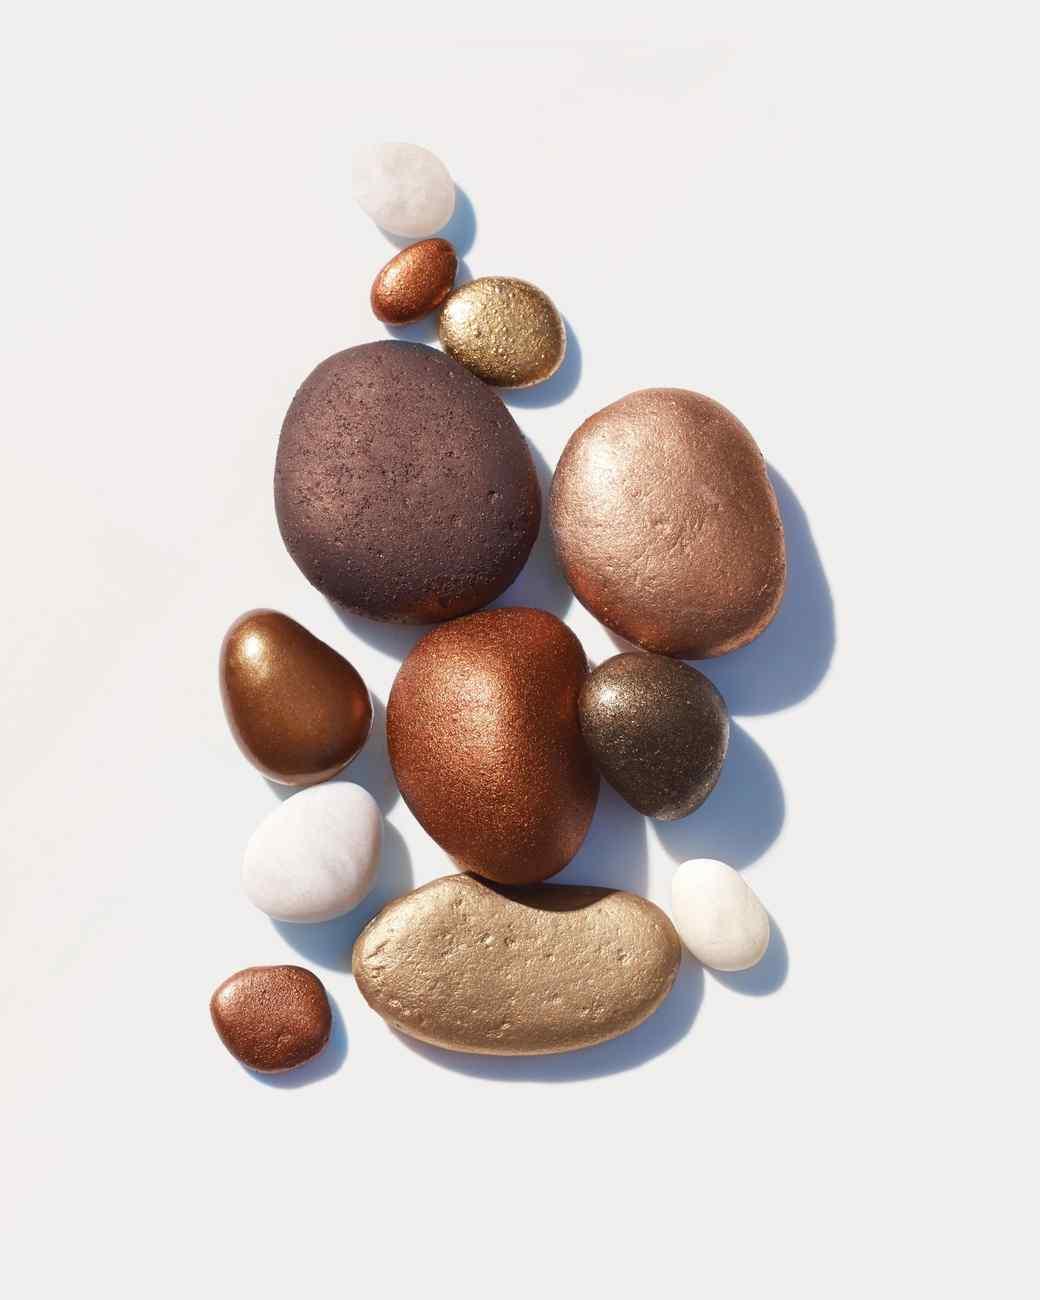 beauty-bronzer-stone-172-d112924.jpg